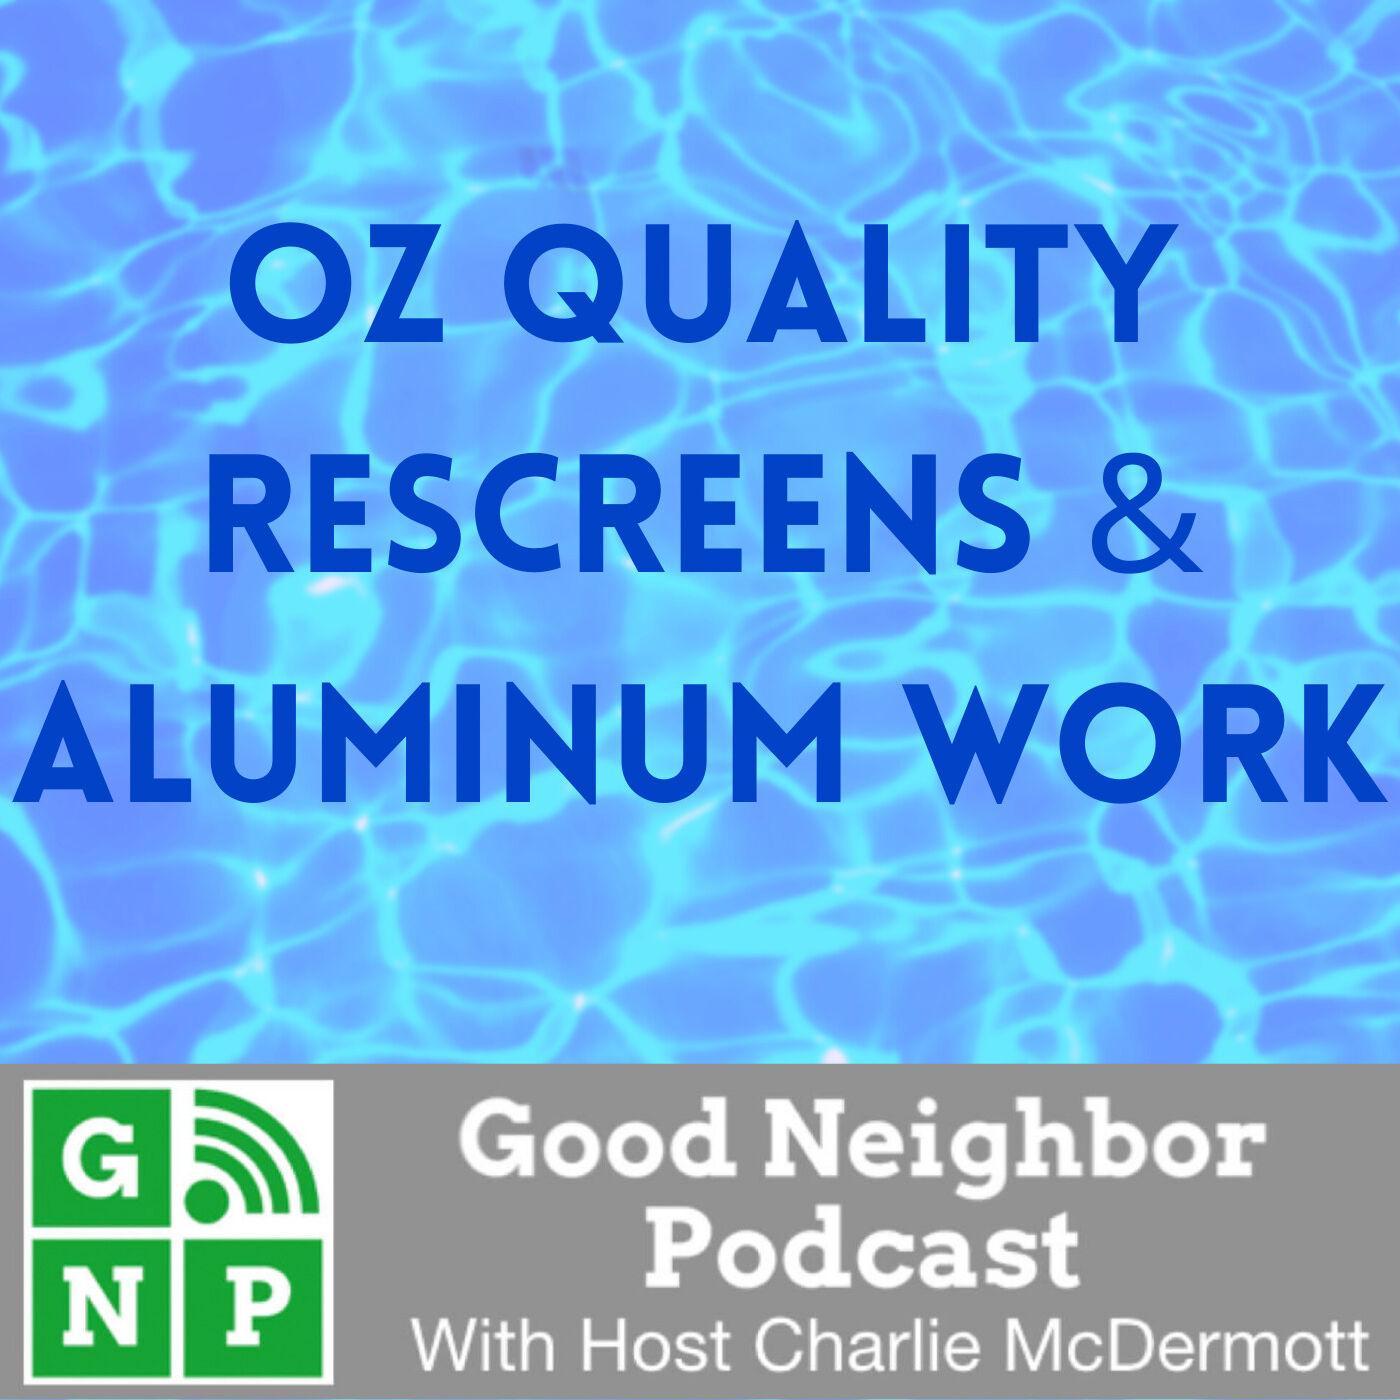 EP #450: Oz Quality Rescreens & Aluminum Work with Oscar Lopez